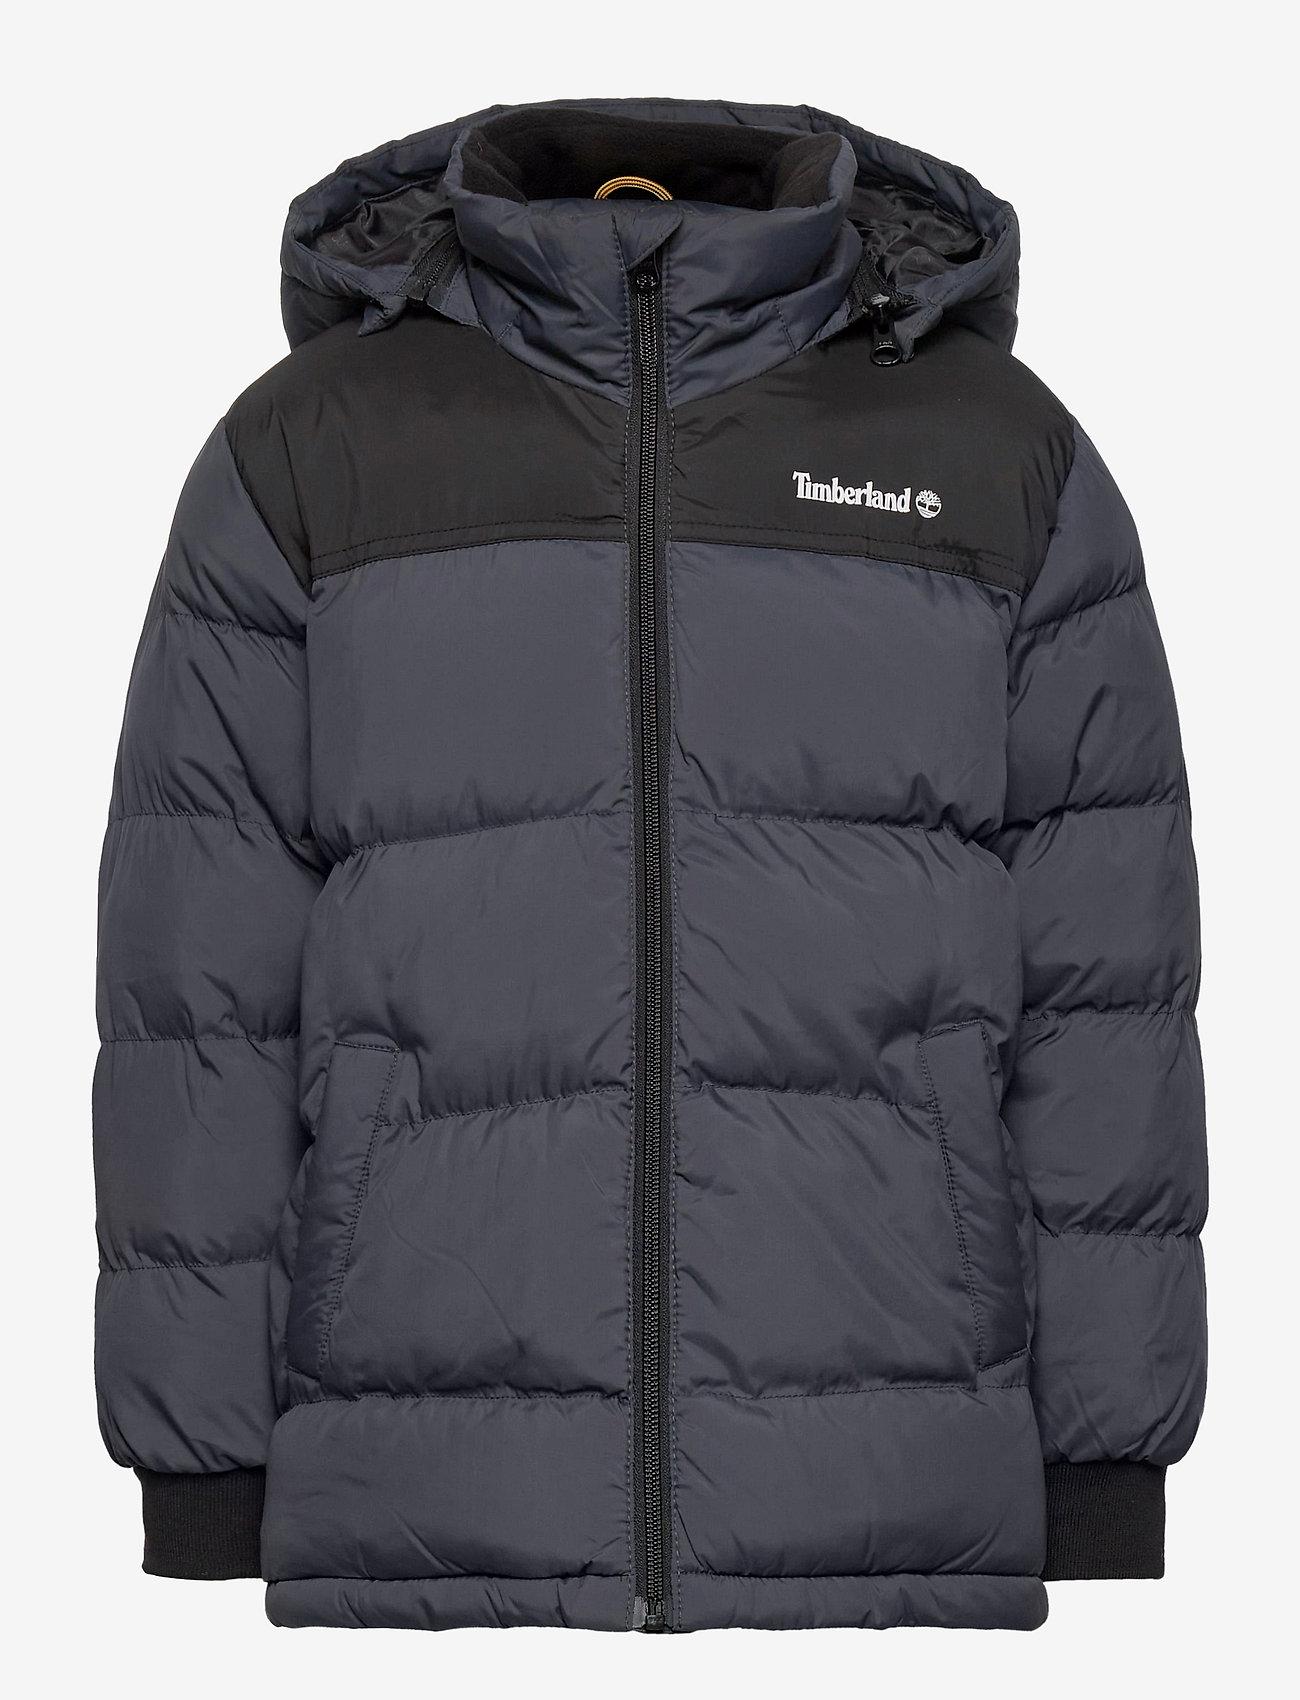 Timberland - PUFFER JACKET - dunjakker & forede jakker - charcoal grey - 0